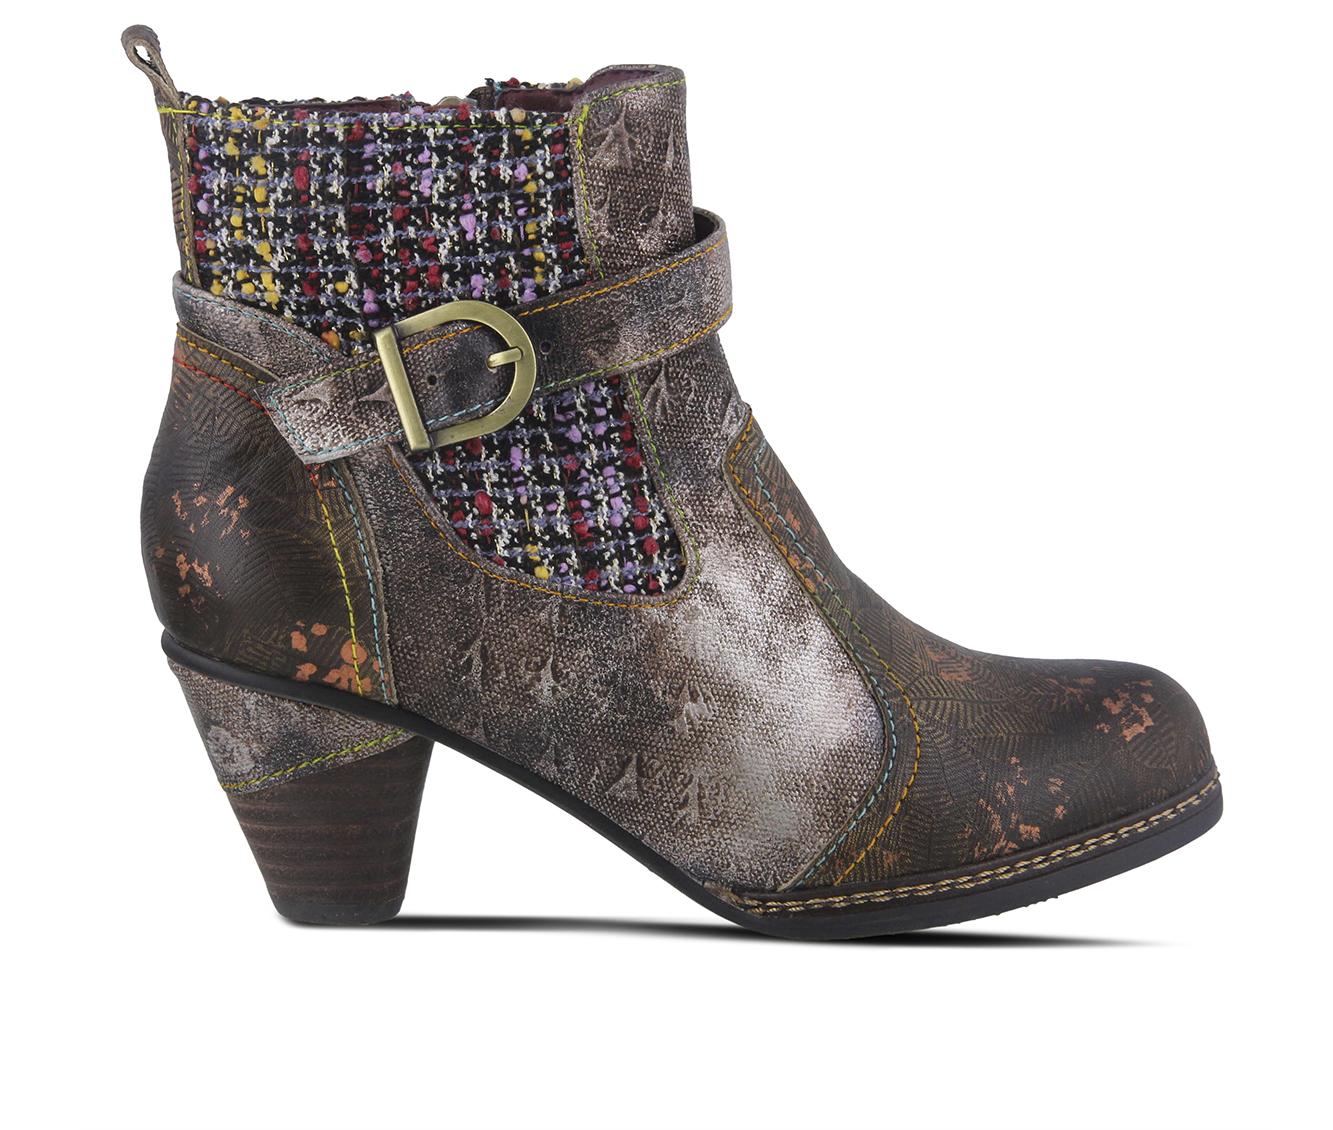 L'Artiste Nancies Women's Boots (Green Leather)